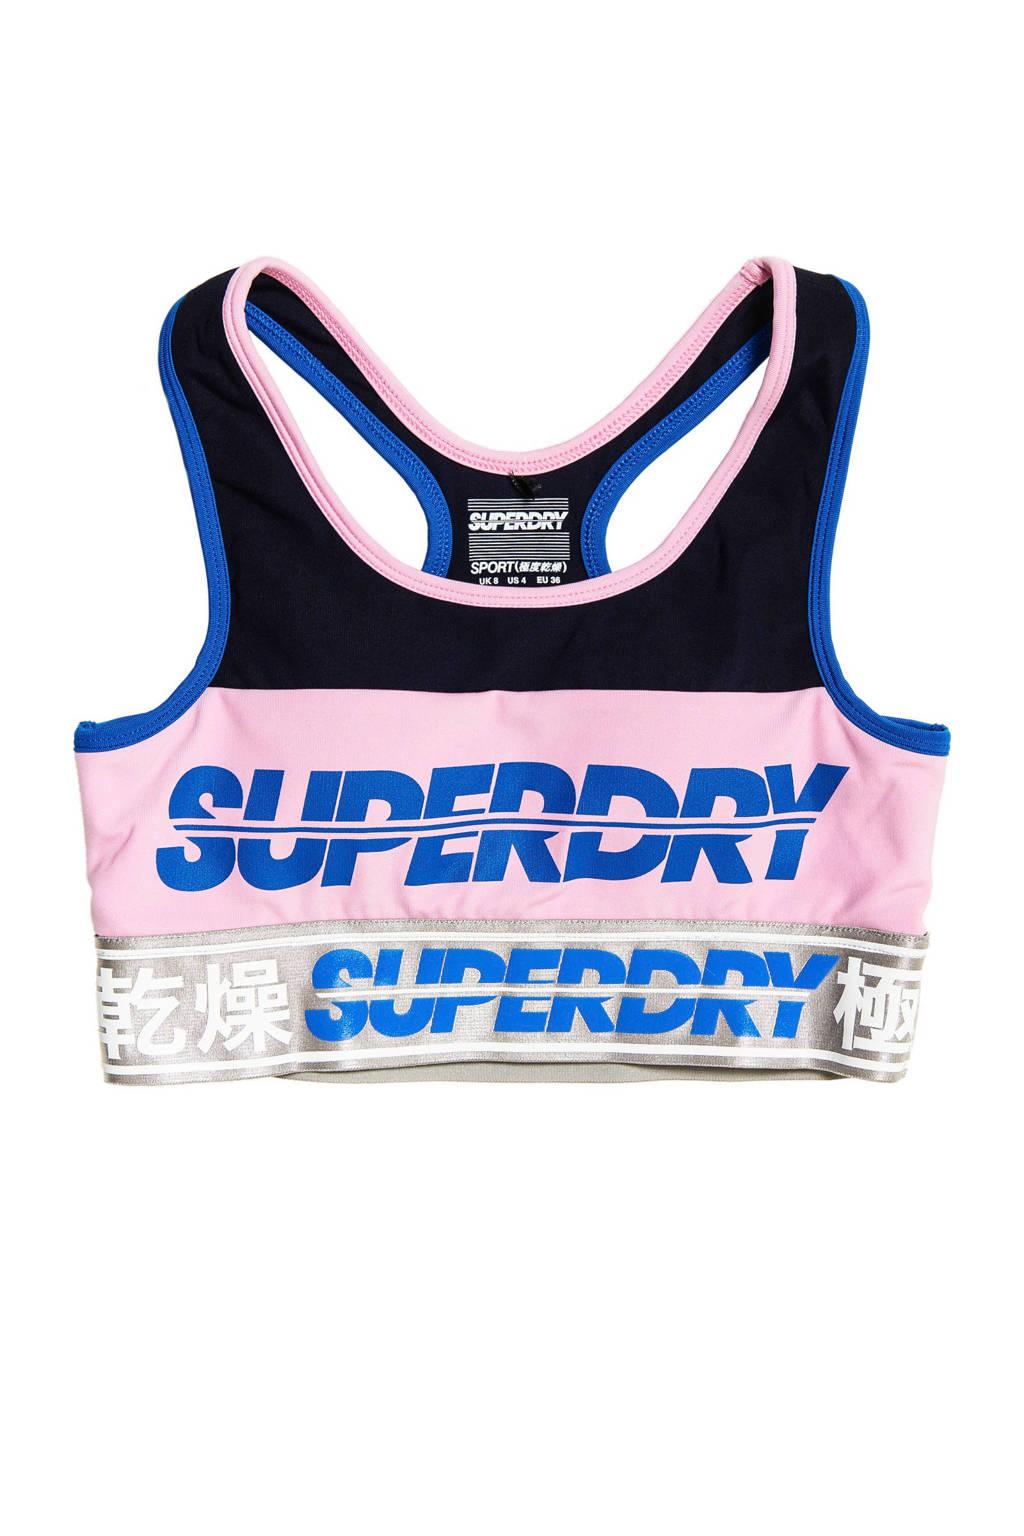 Superdry Sport Level 1 sportbh, Roze/zwart/blauw